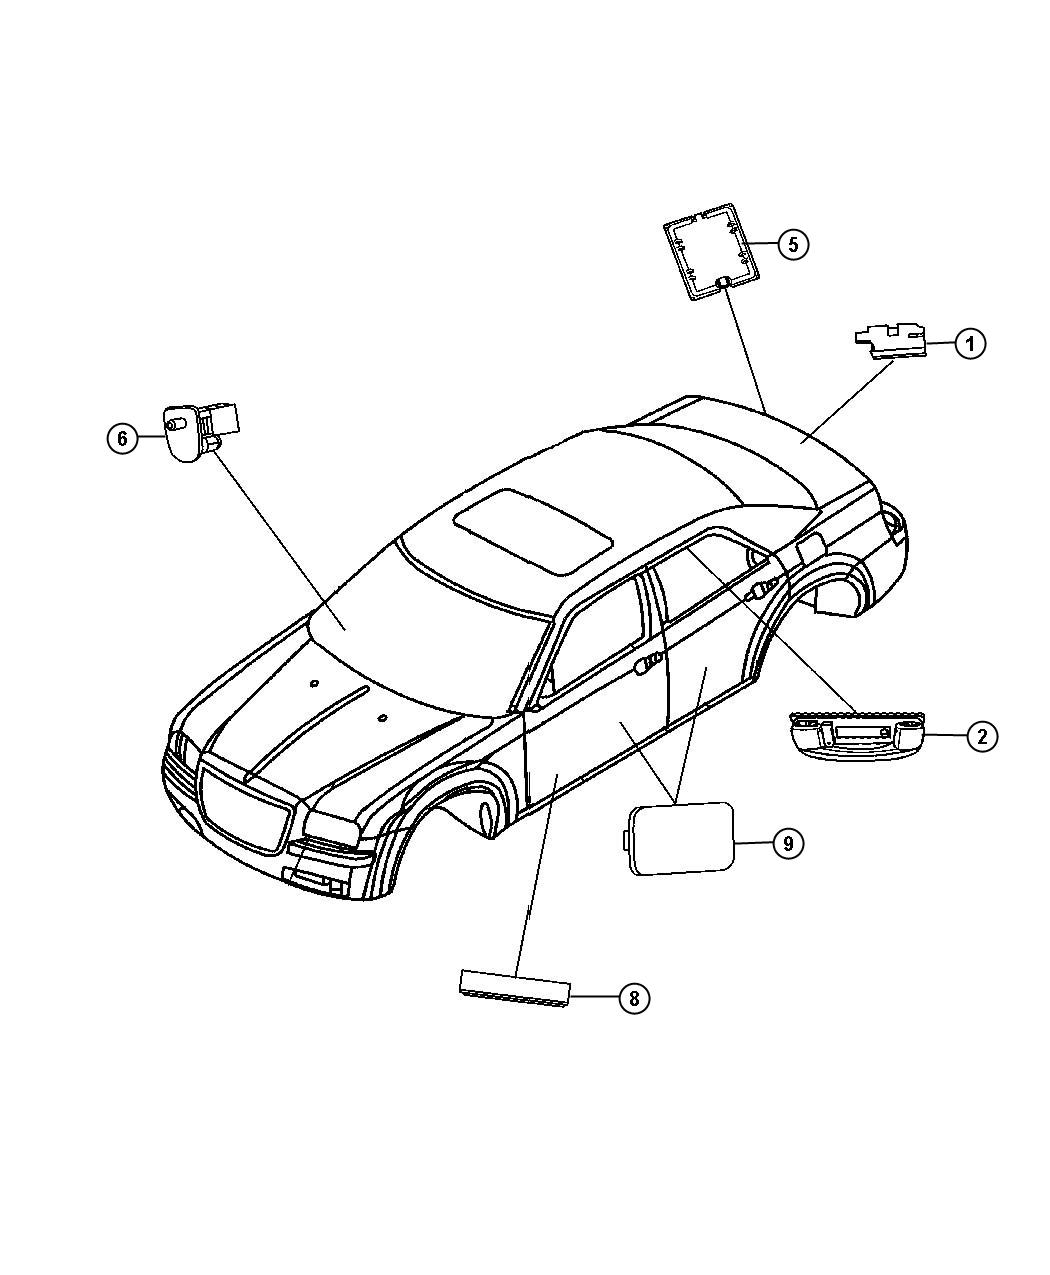 Dodge Charger R T 5 7l Hemi V8 Lamp Liftgate Lamps